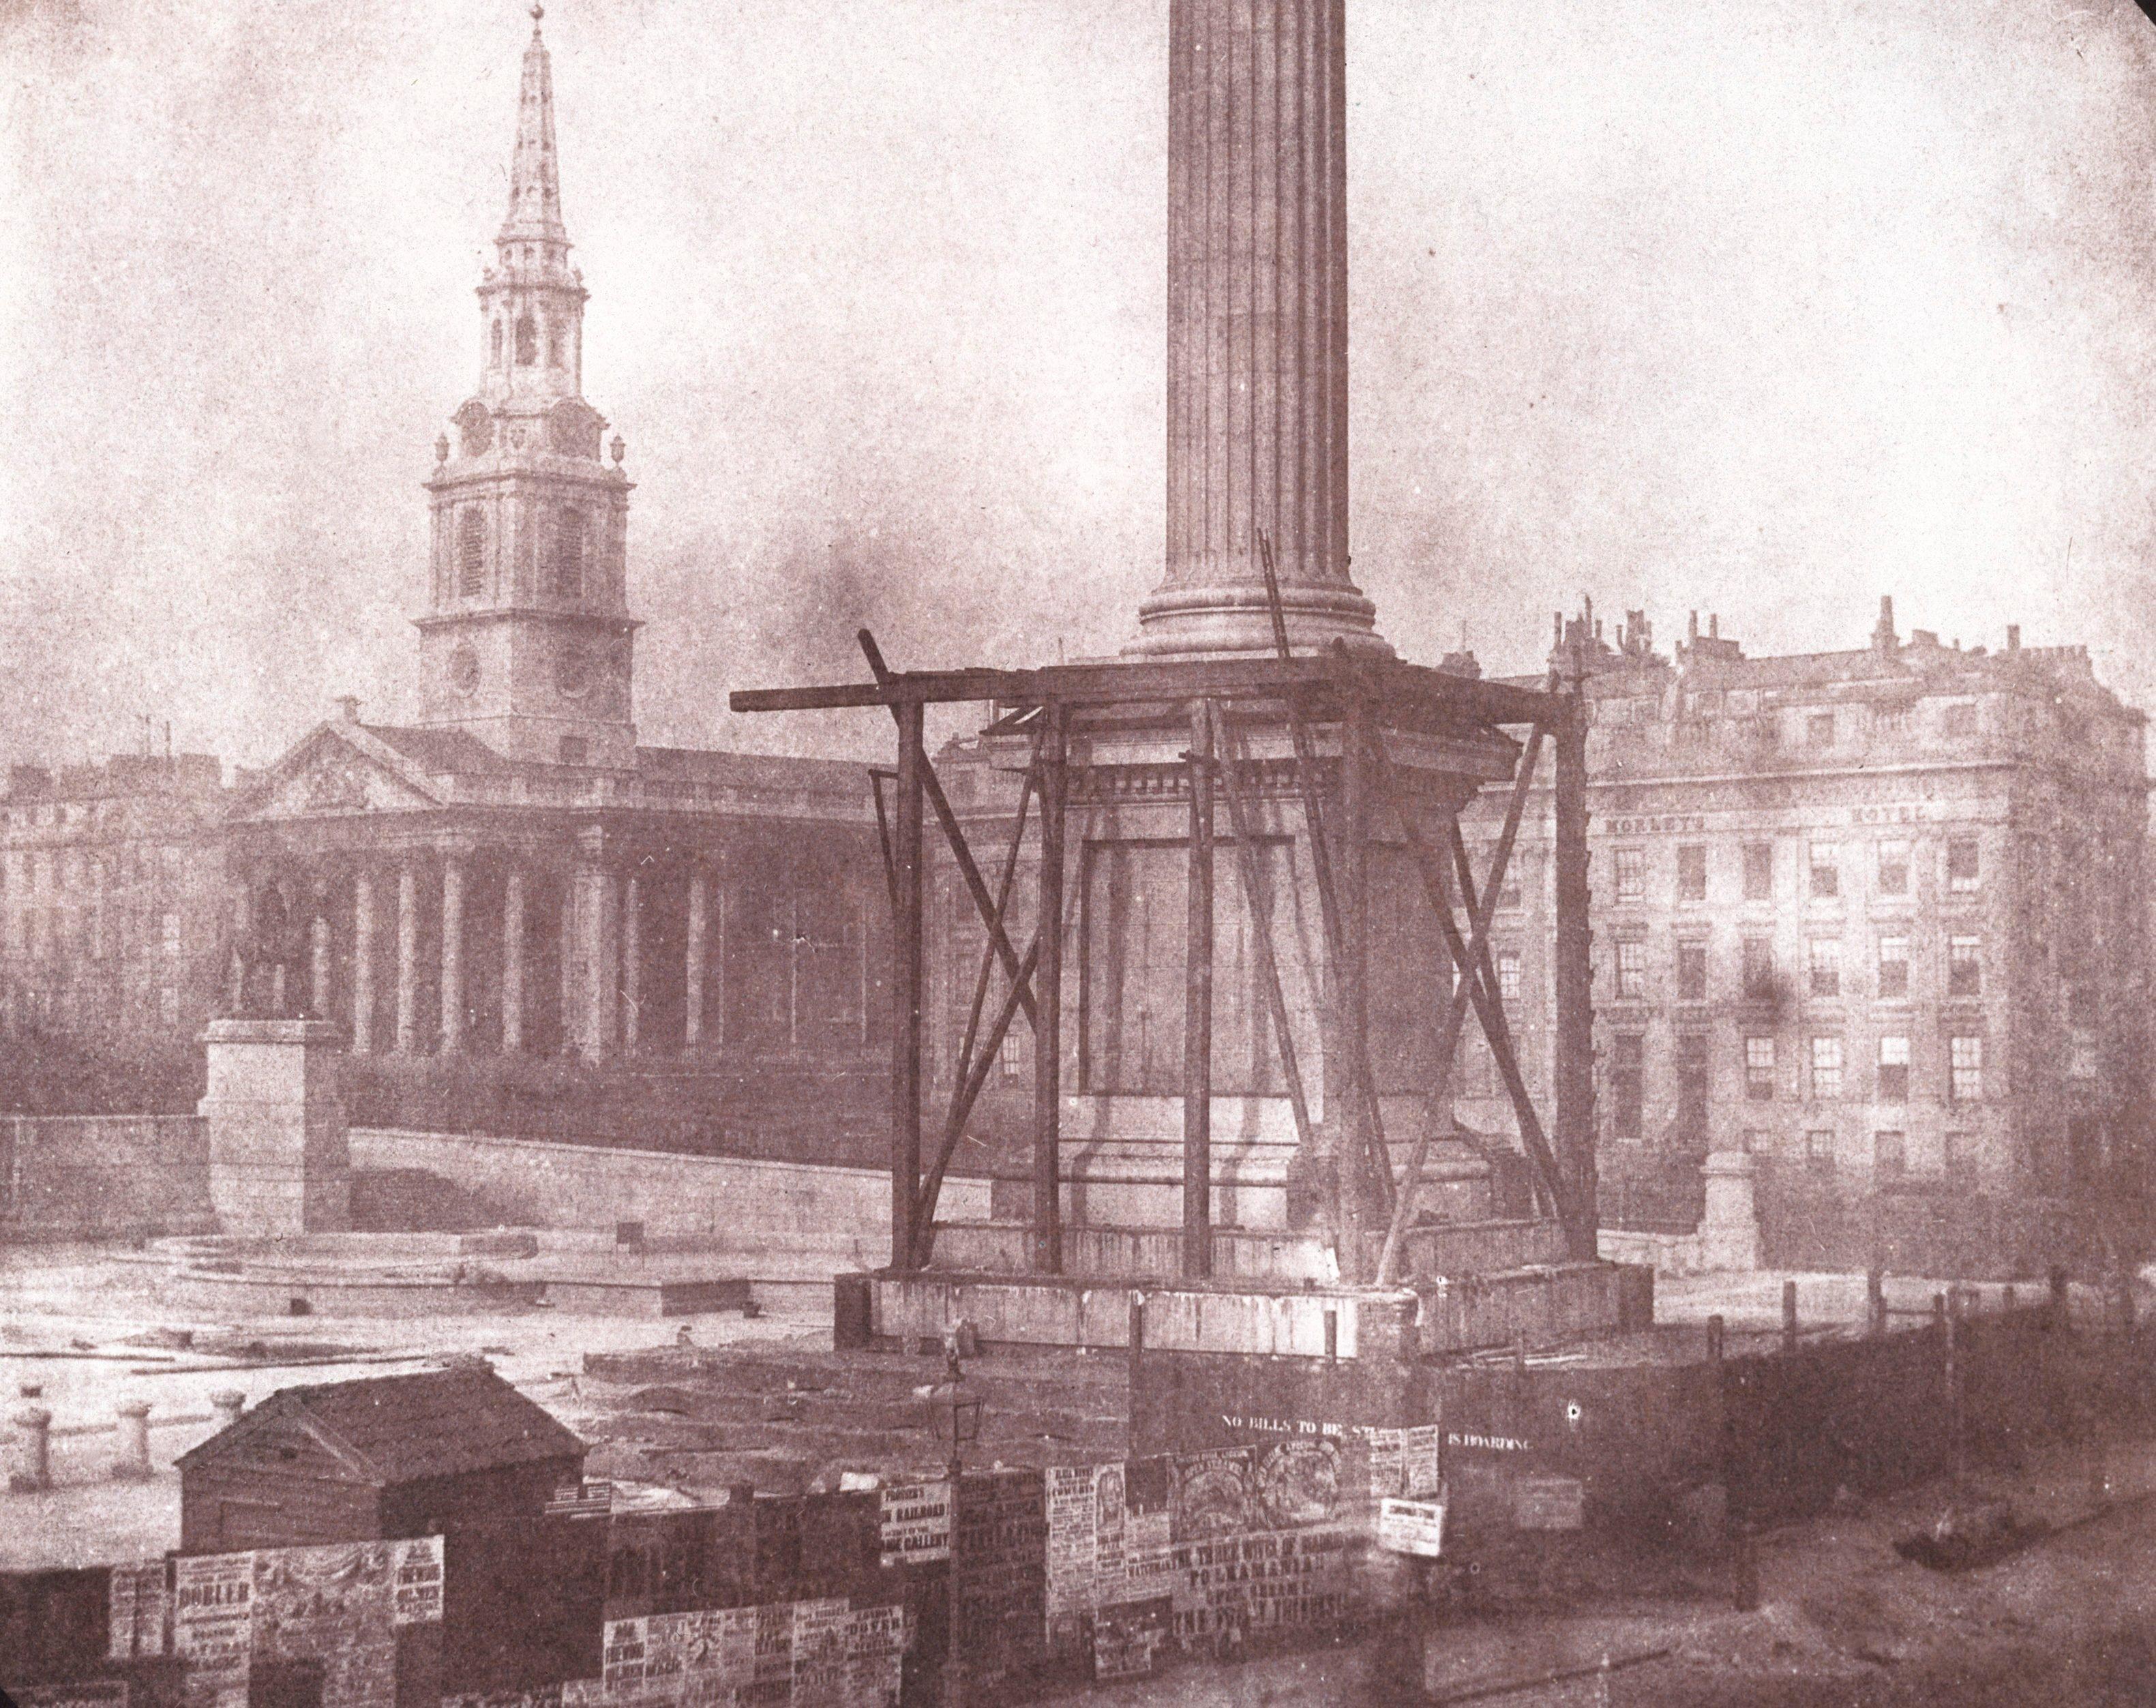 Nelsons Column under Construction, Trafalgar Square, London, April 1844.